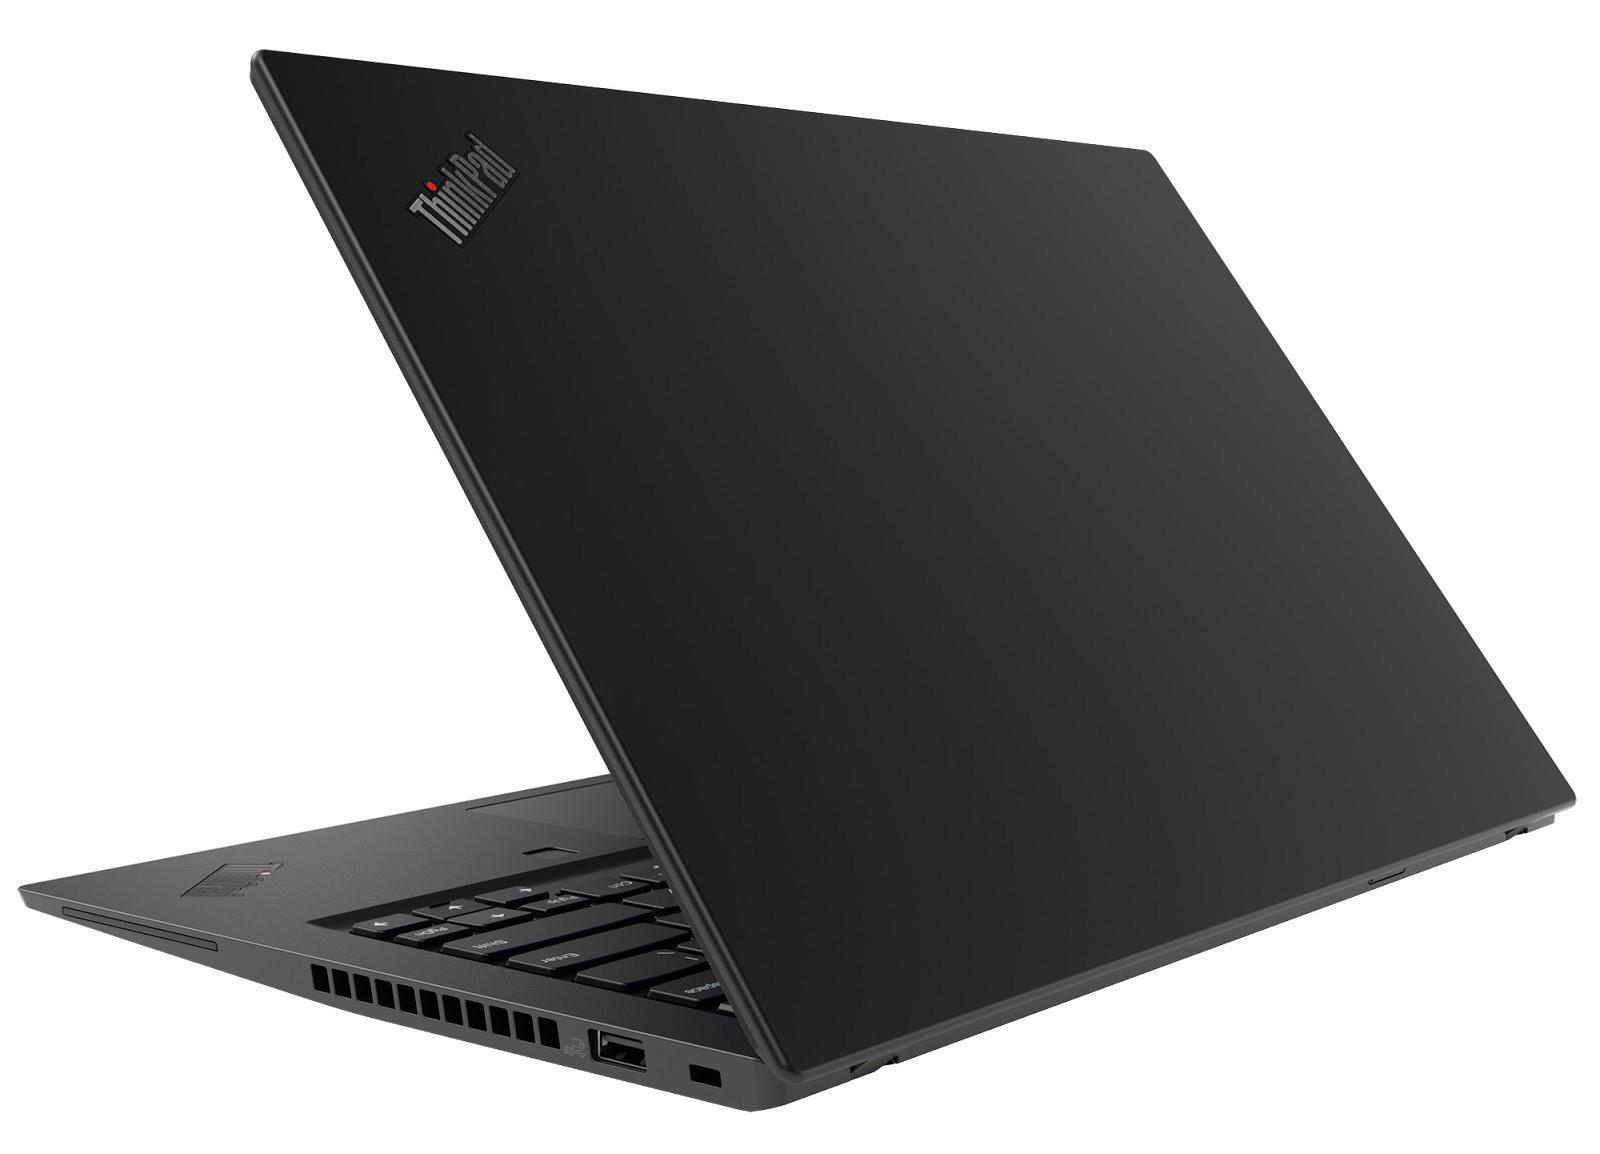 Фото 2. Ноутбук Lenovo ThinkPad T14 Gen 1 Black (20S00013RT)